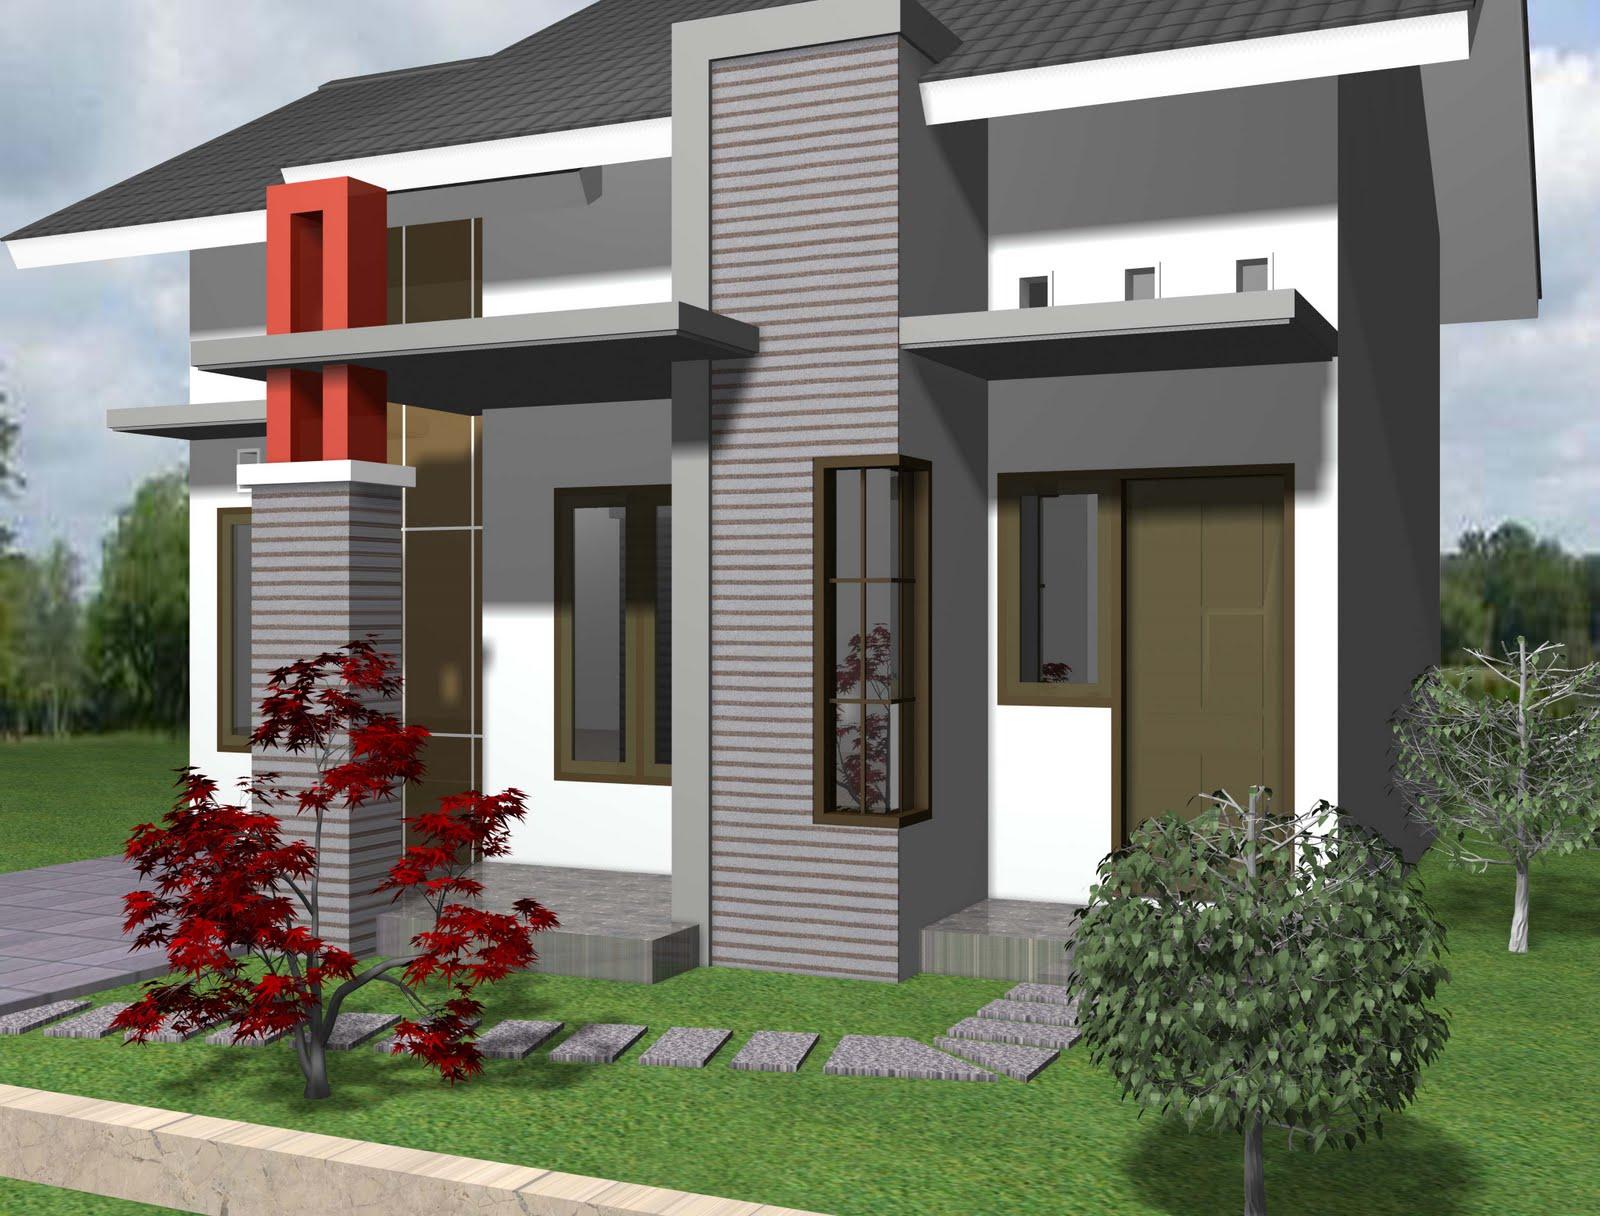 Desain Gambar Rumah Minimalis Type 21 1 Lantai | Contoh Rumah Minimalis Type 21 2 Lantai